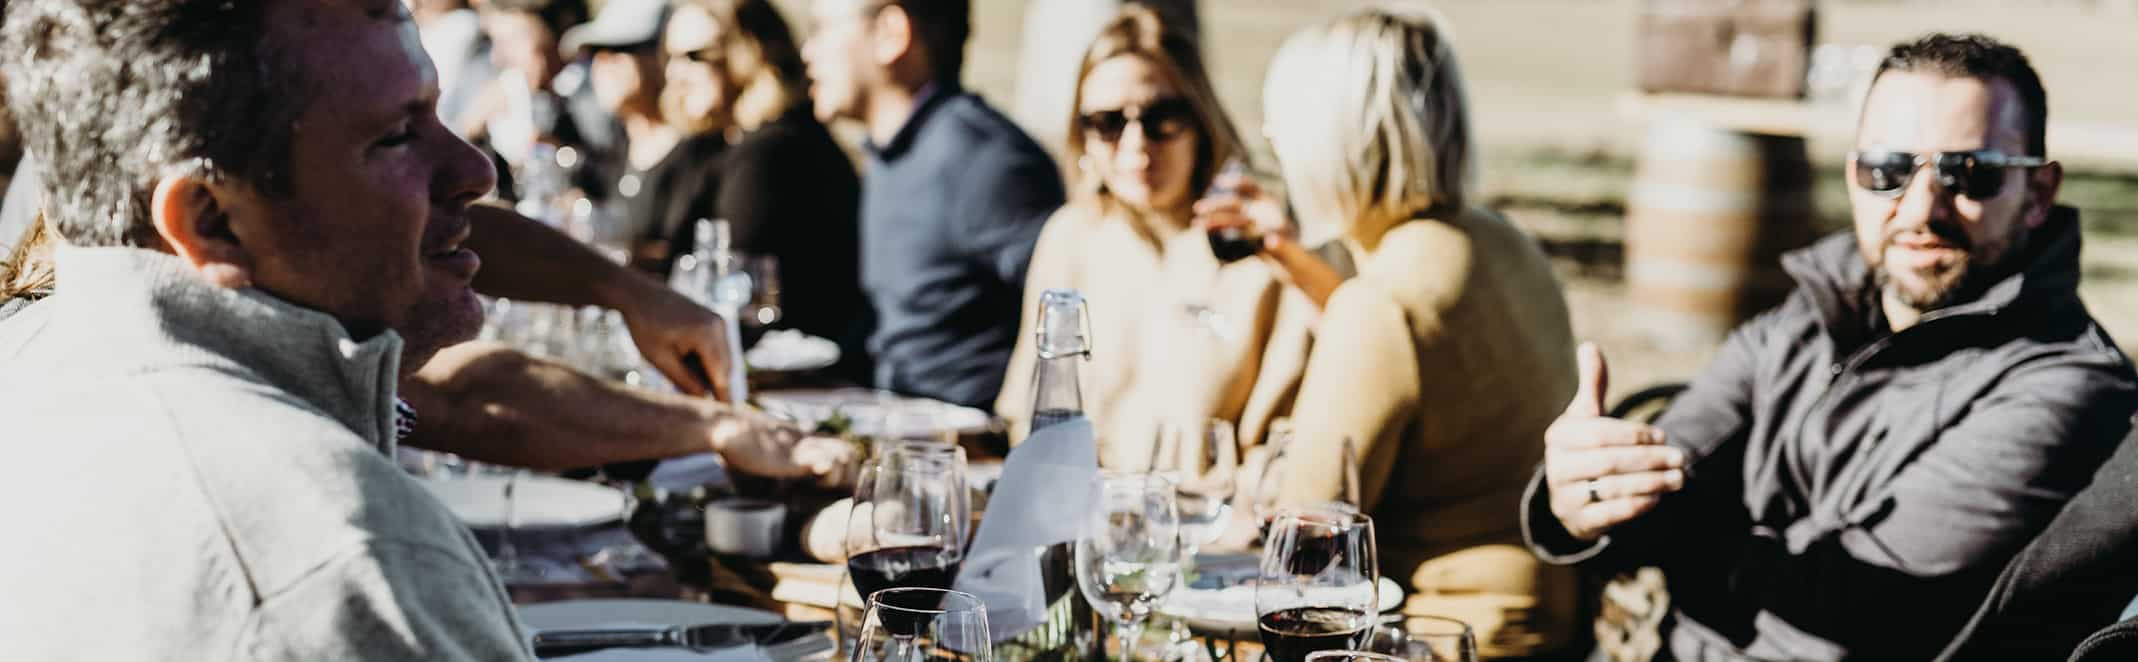 Sociable dinner table